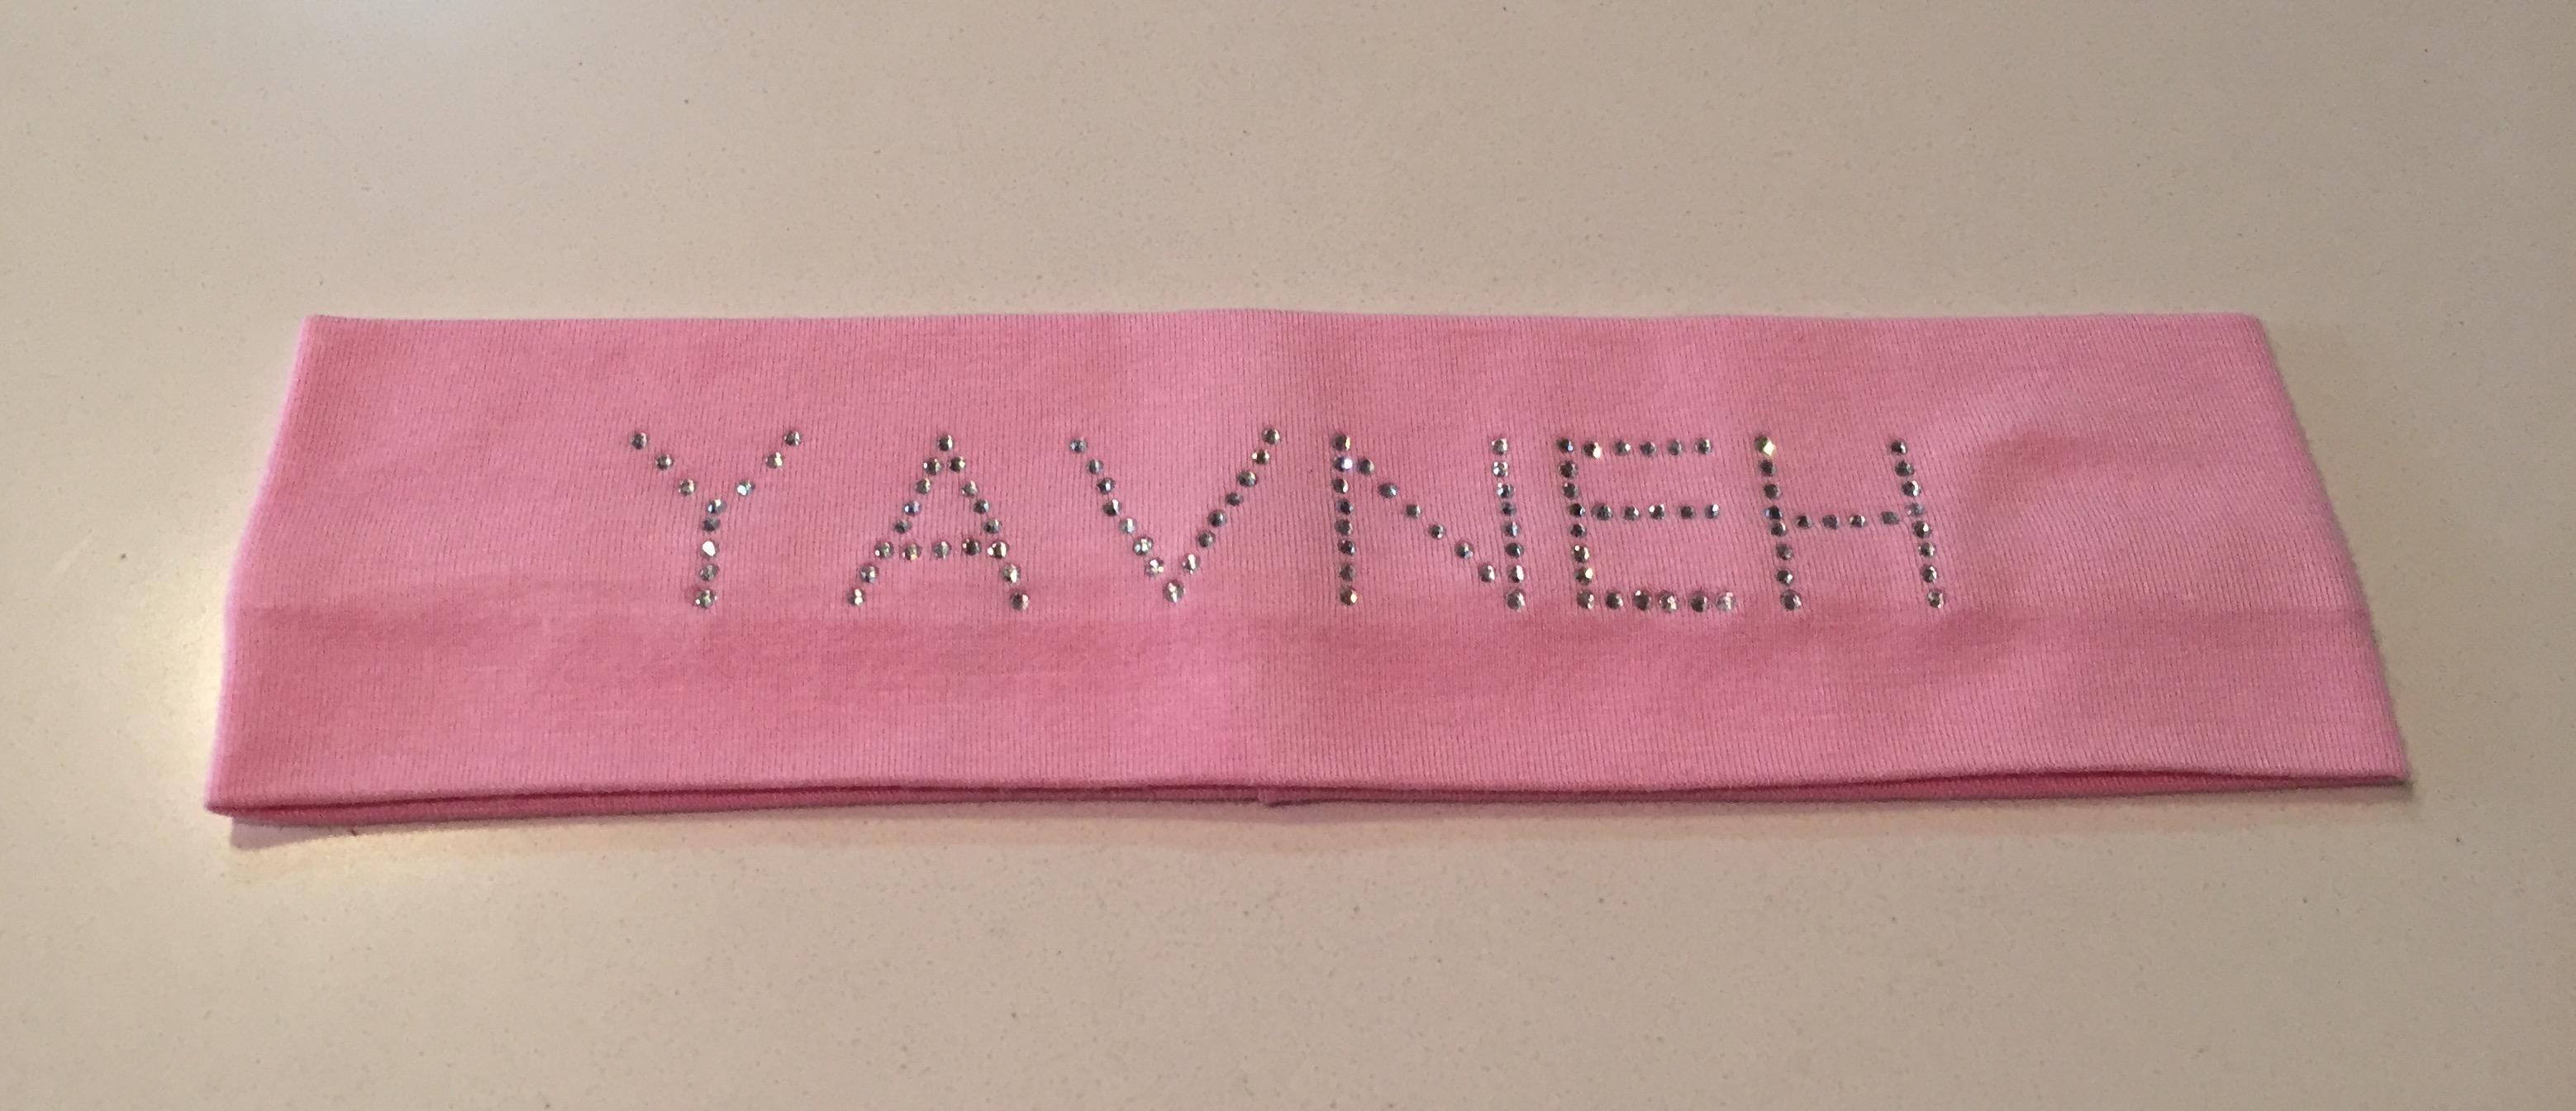 pink headband.jpg